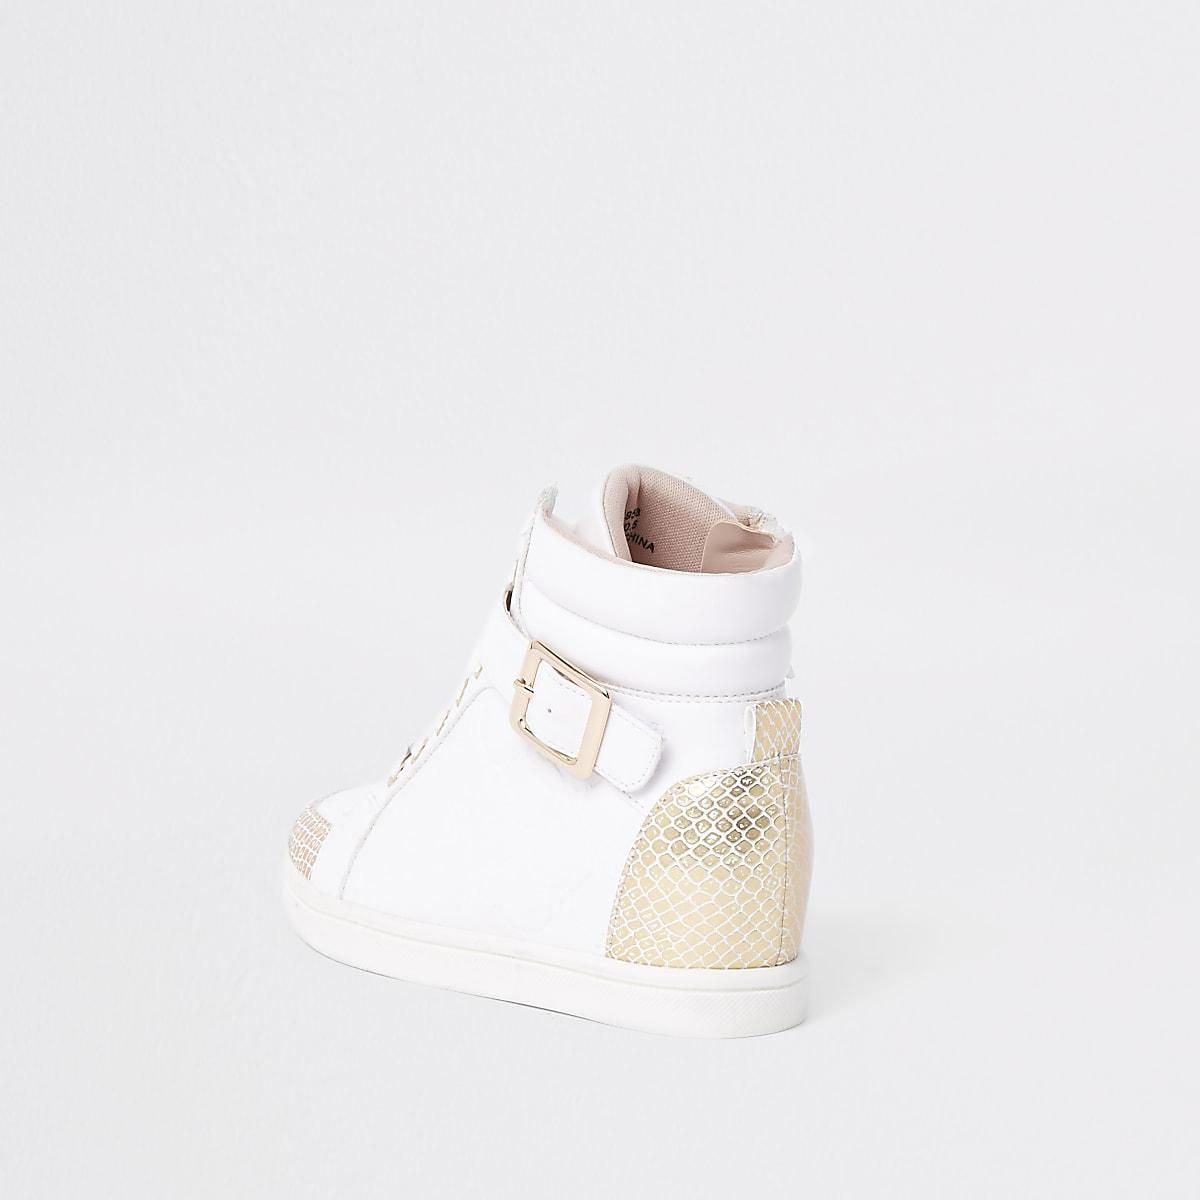 c2d05b179 Girls white high top RI monogram trainers - Trainers - Footwear - girls